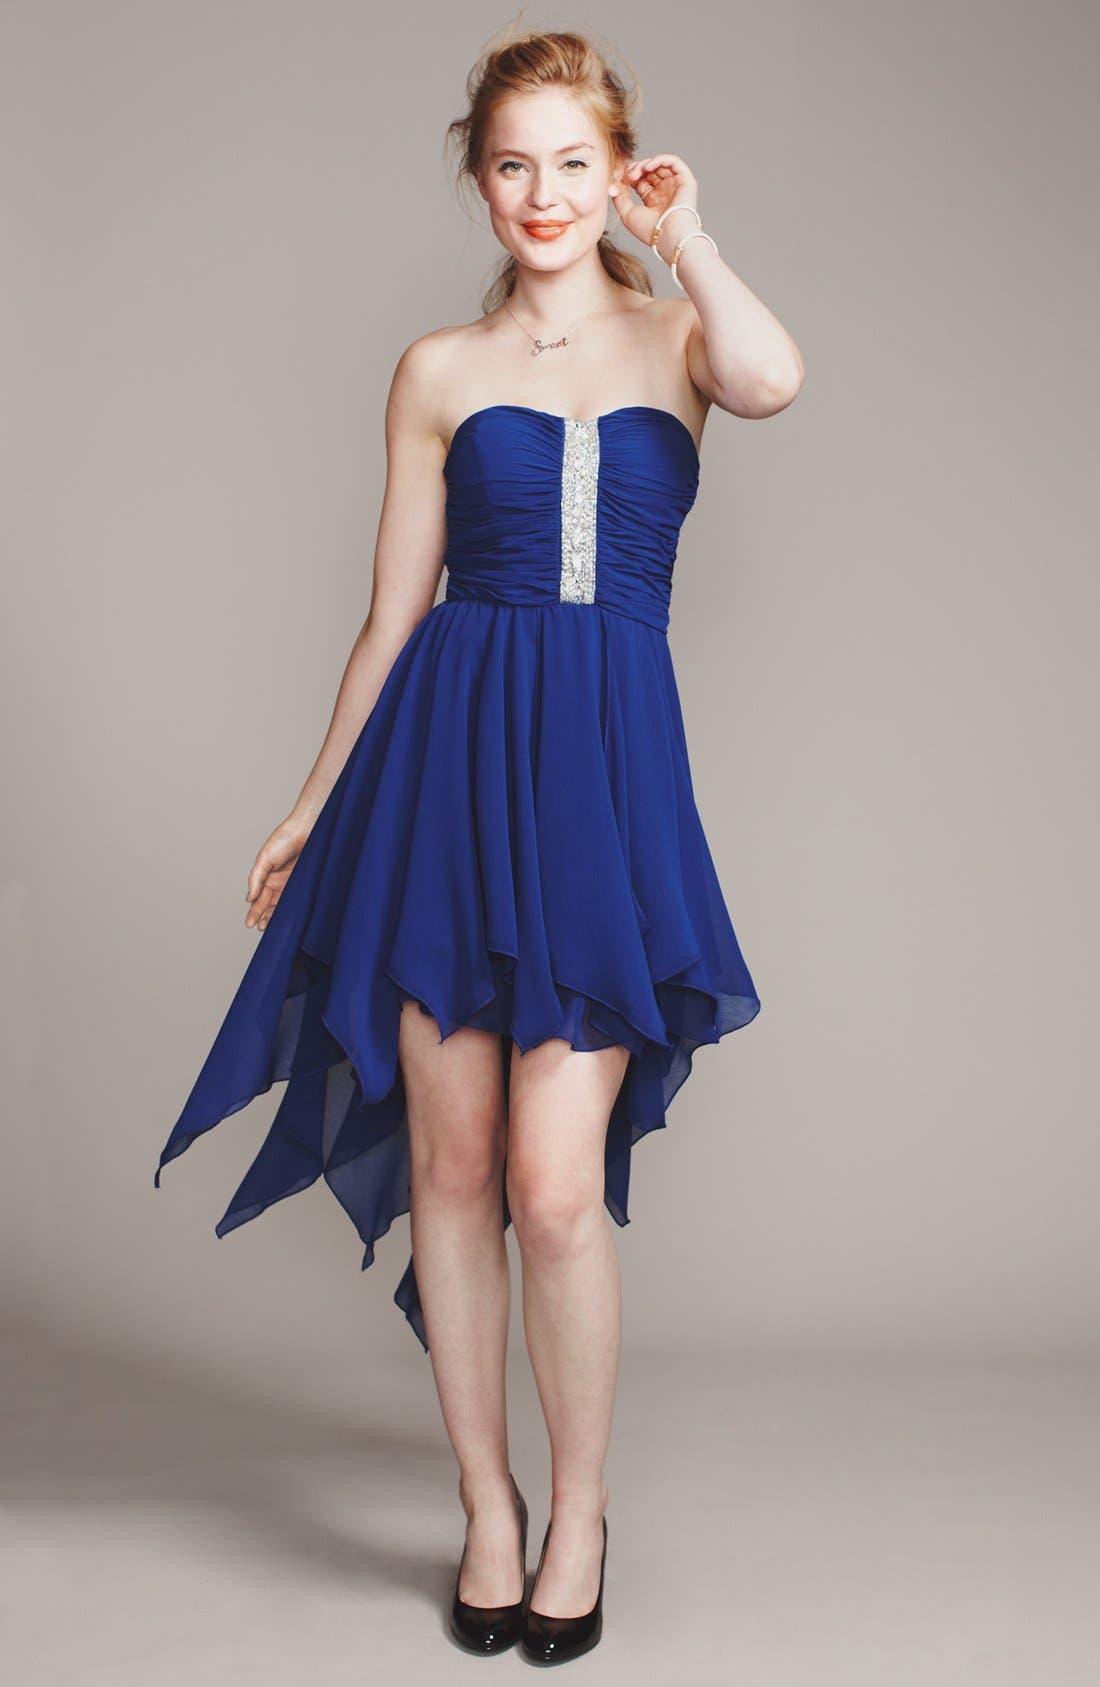 Alternate Image 1 Selected - As U Wish Dress & Accessories